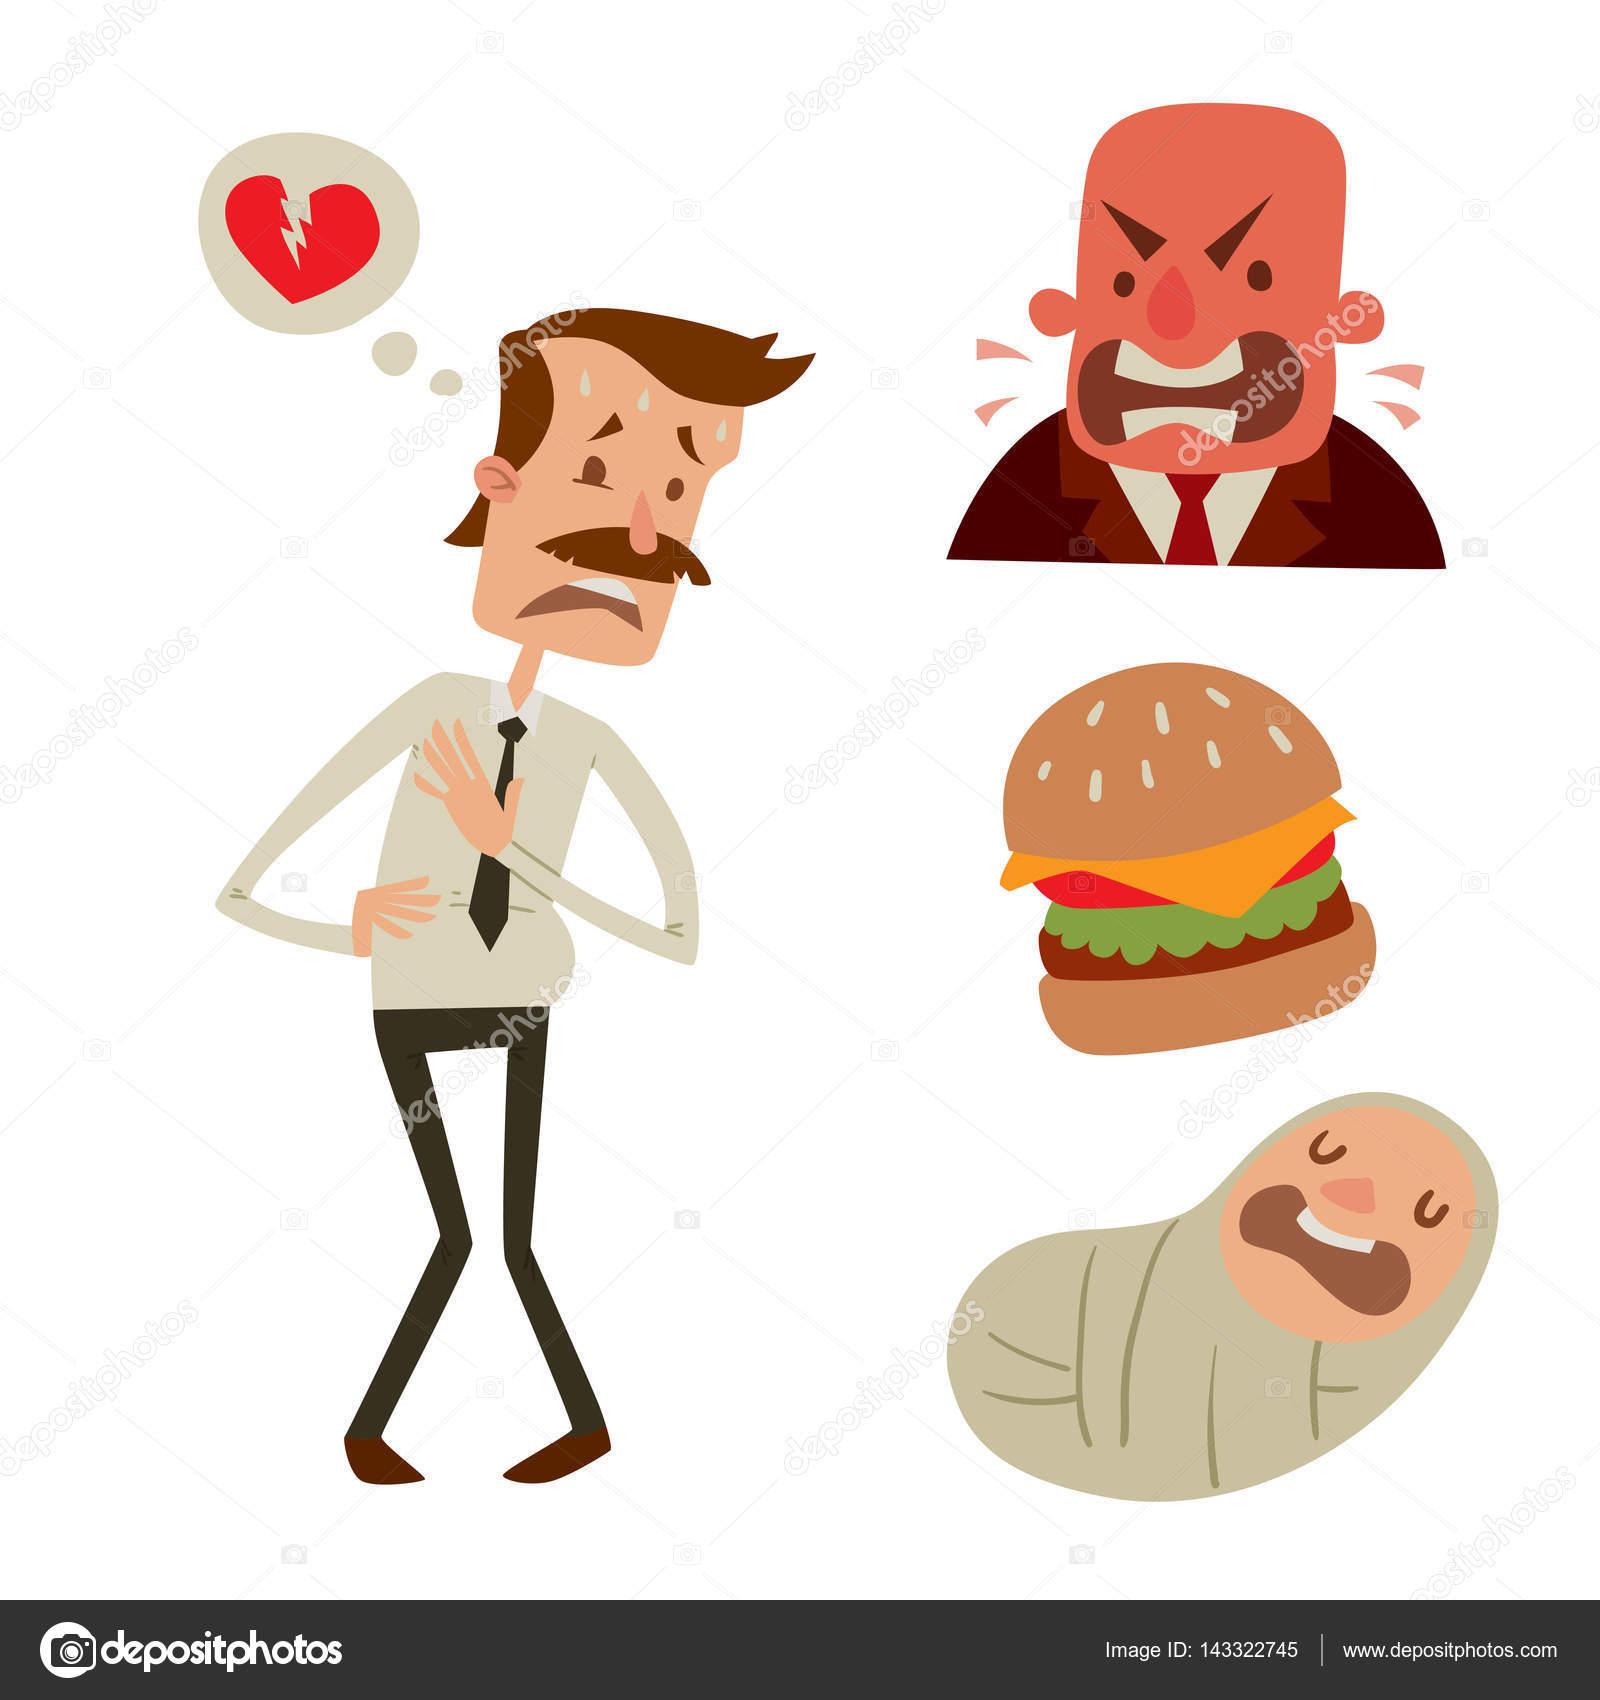 Health Food Stres